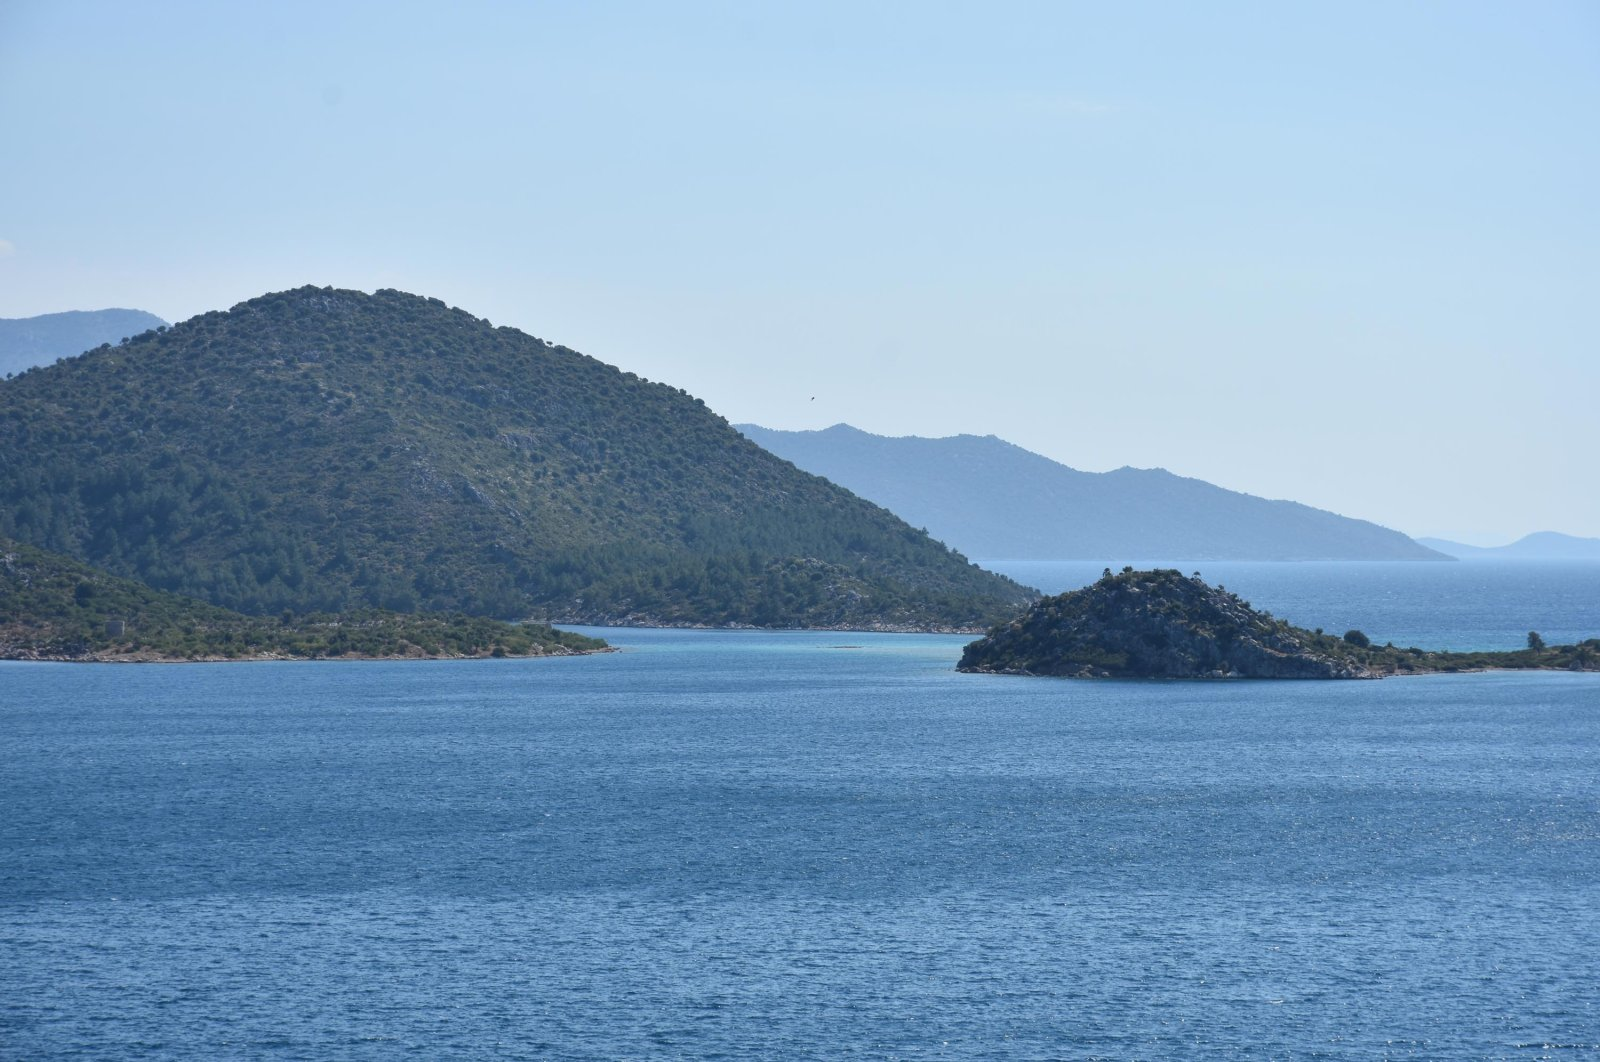 The Aegean Sea off Turkey's southwestern Muğla province, Aug. 11, 2020. (DHA Photo)